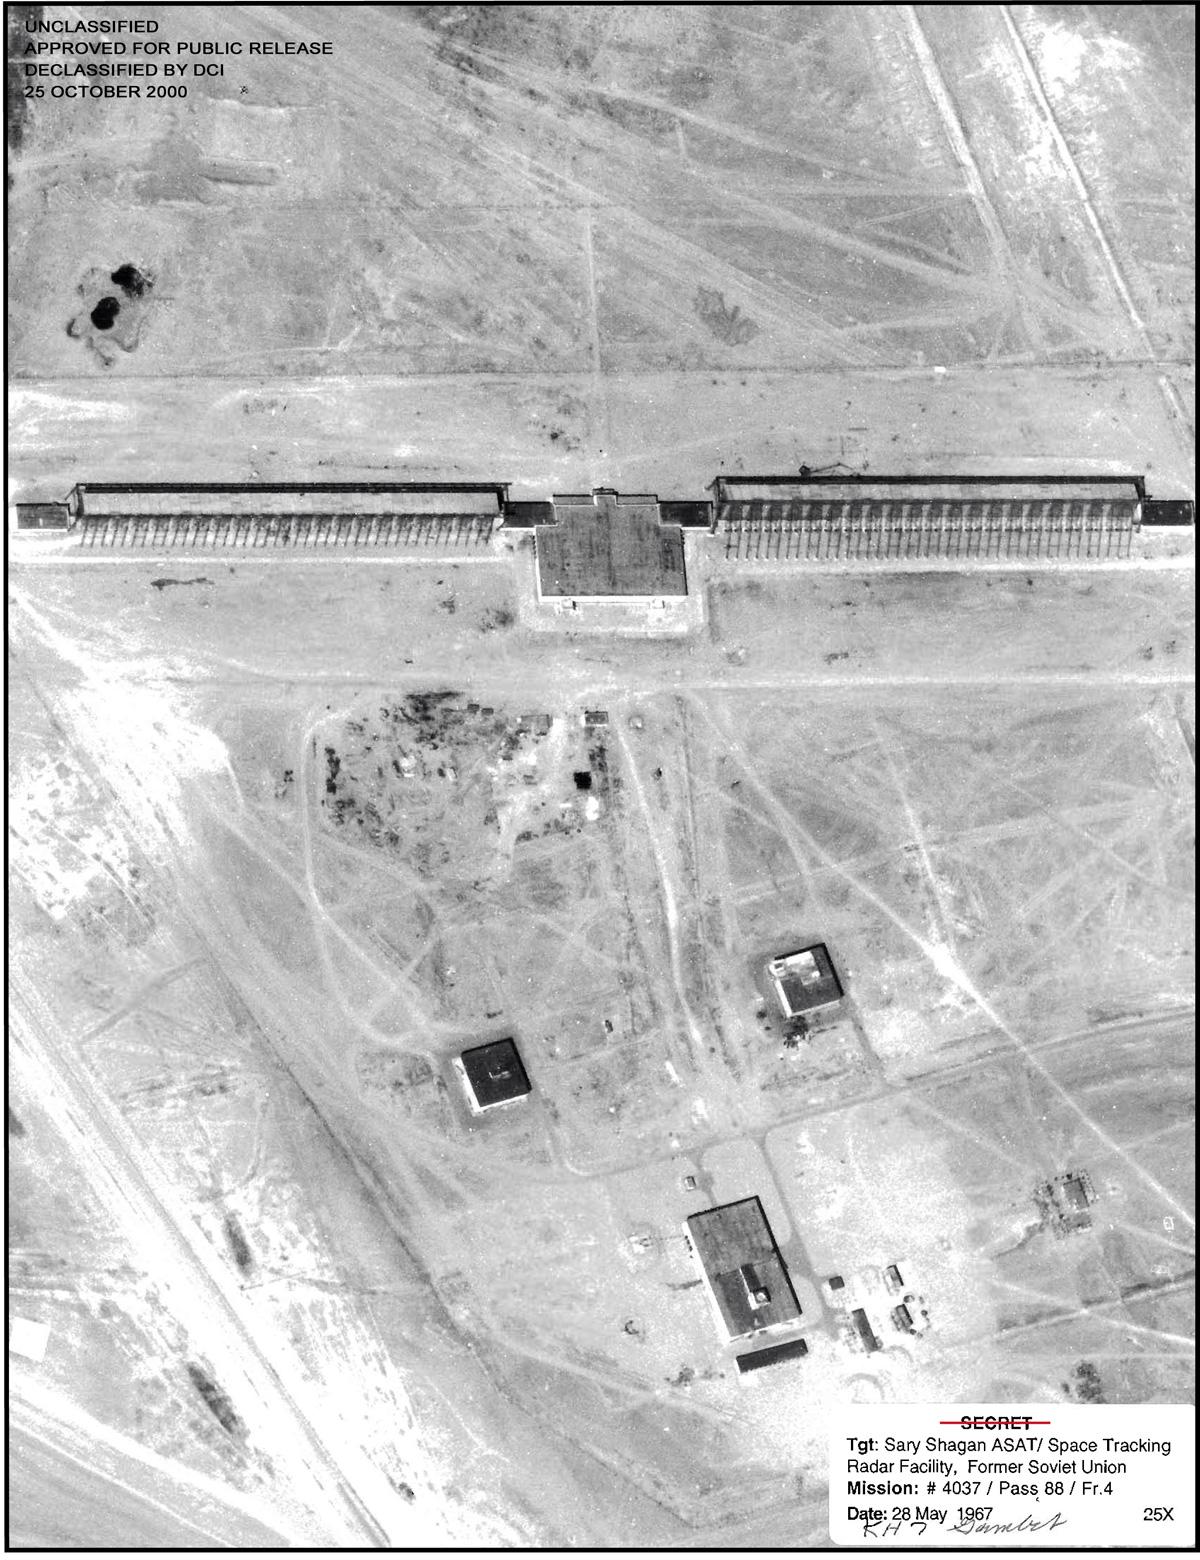 Hen House radars at the Sary Shagan anti-ballistic missile test and development center